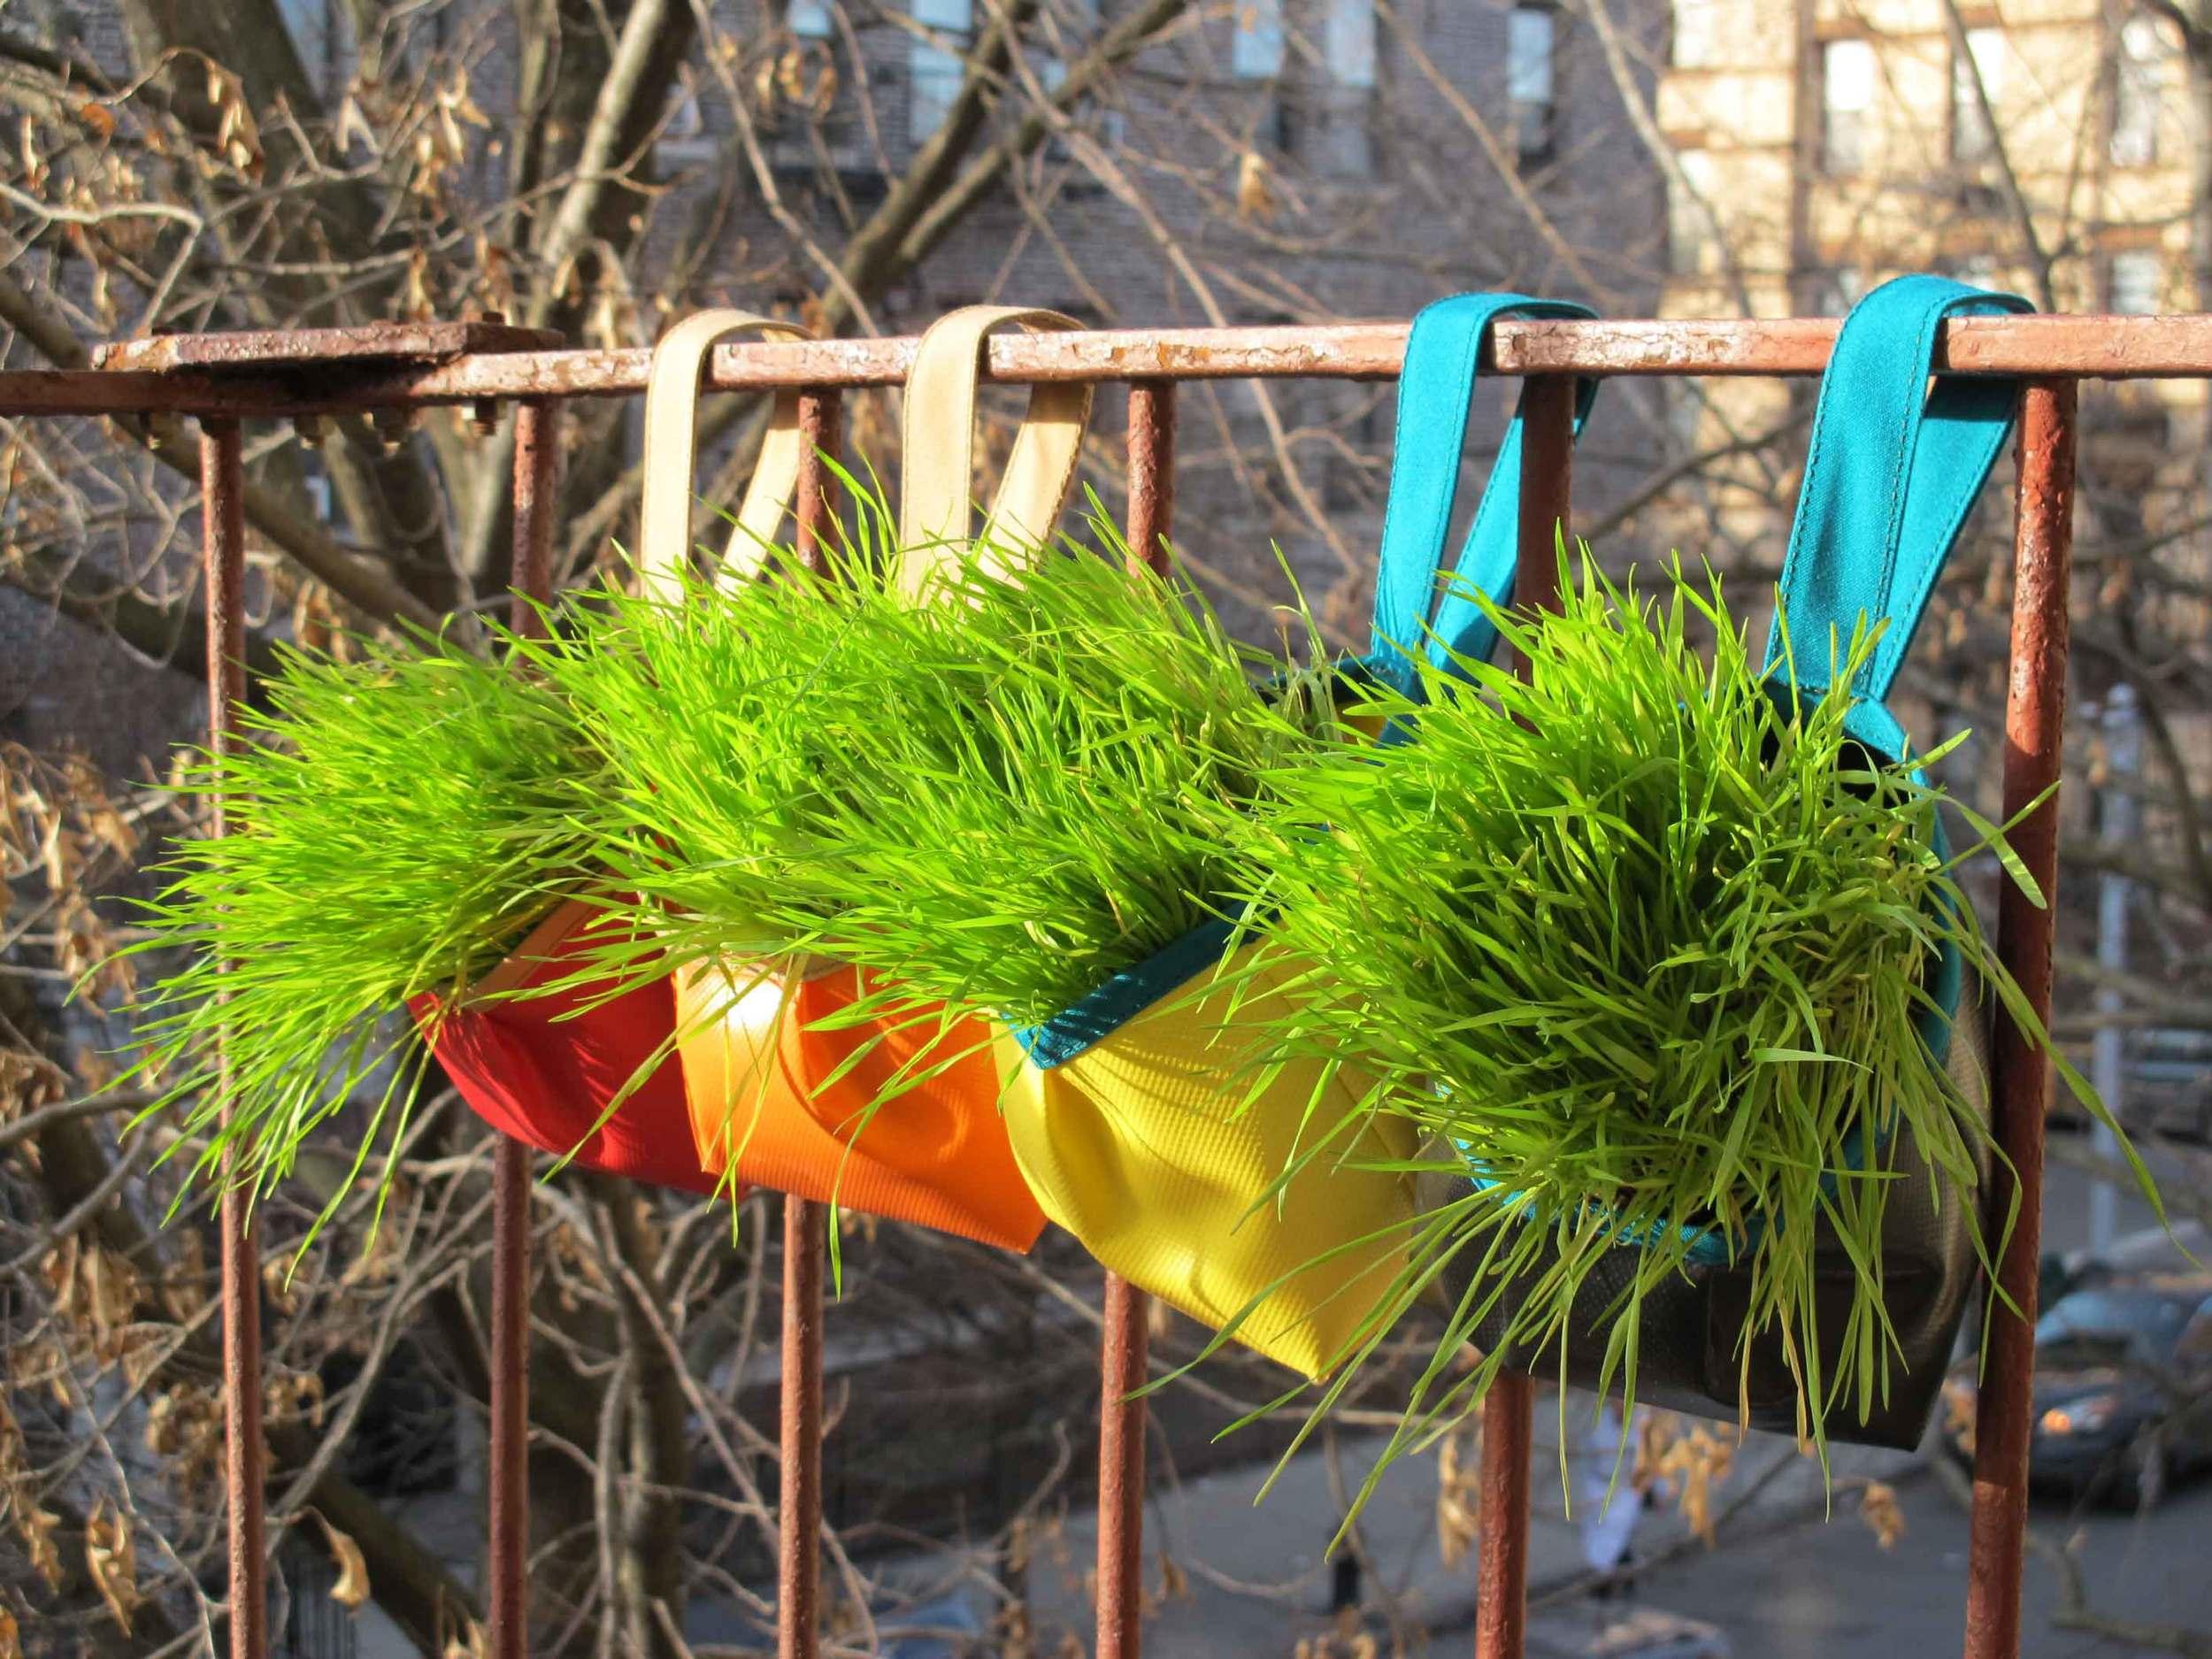 garden totes for urban landscapes